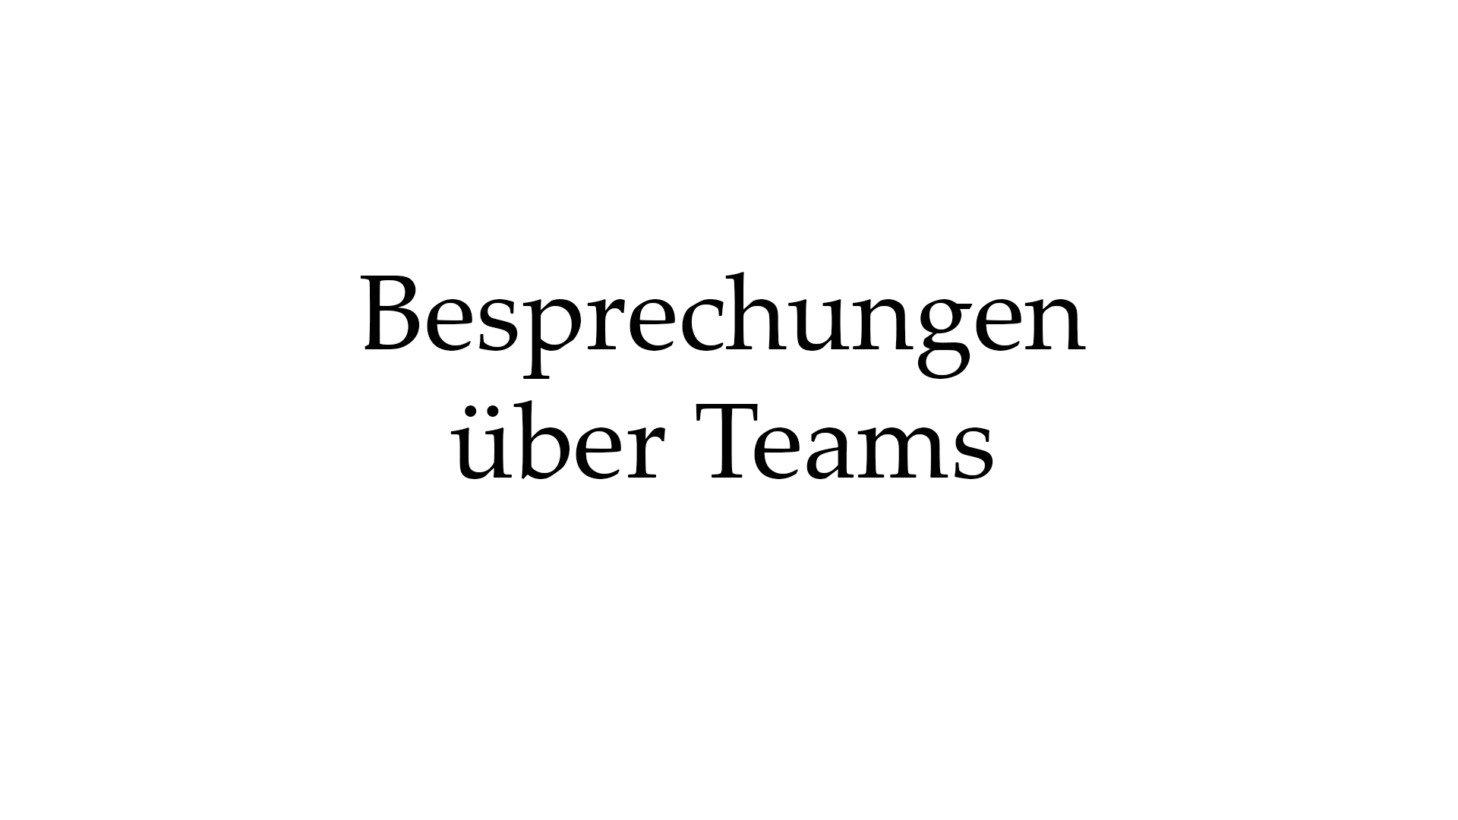 Besprechungen über Teams